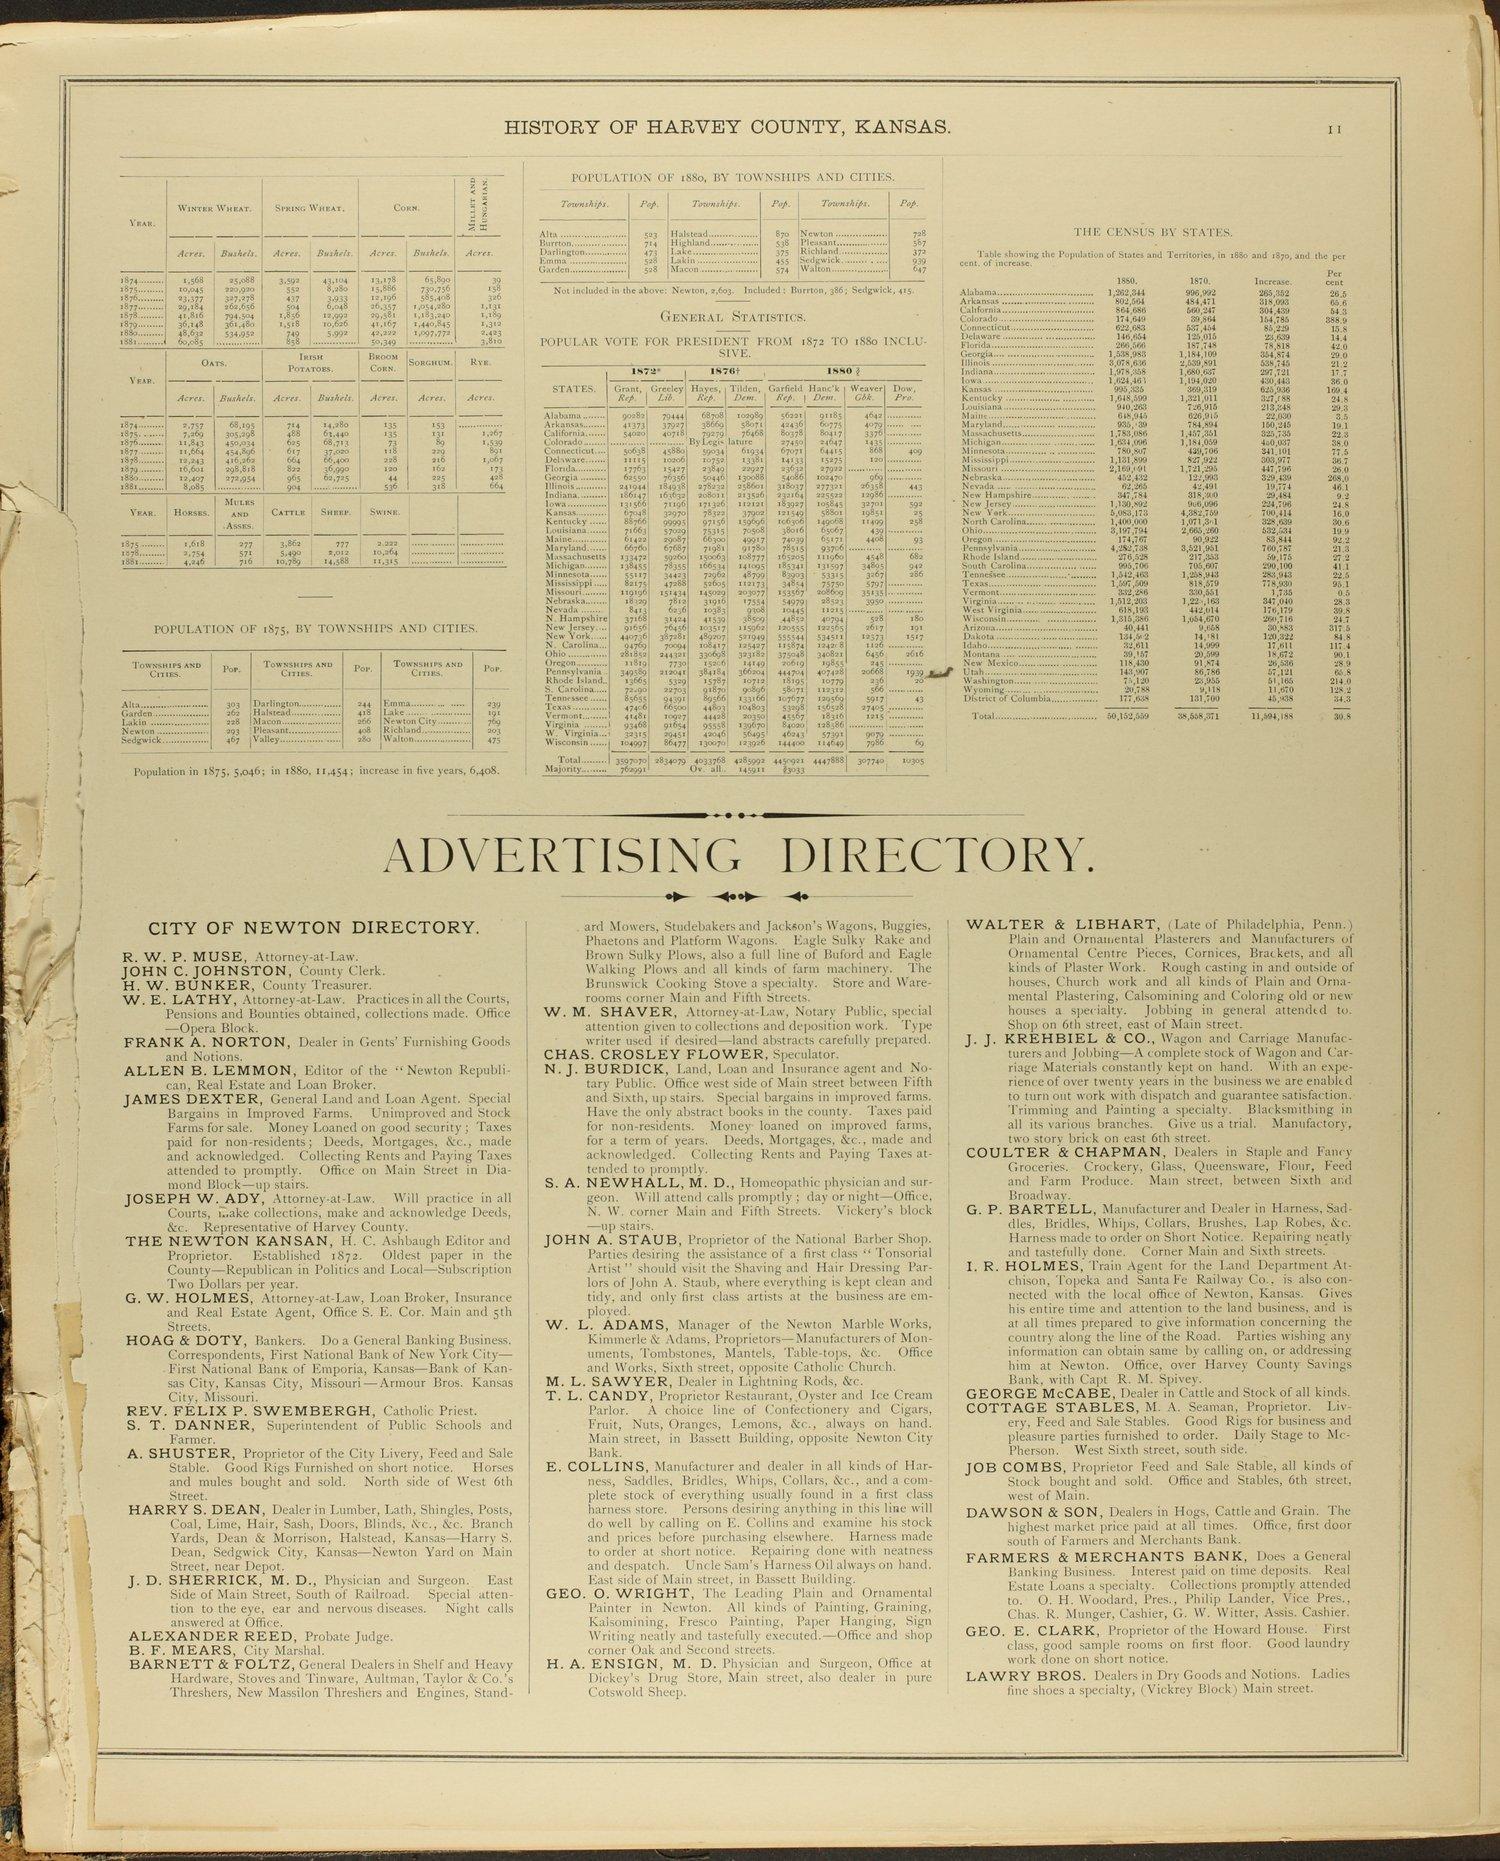 Historical atlas of Harvey County, Kansas - 11